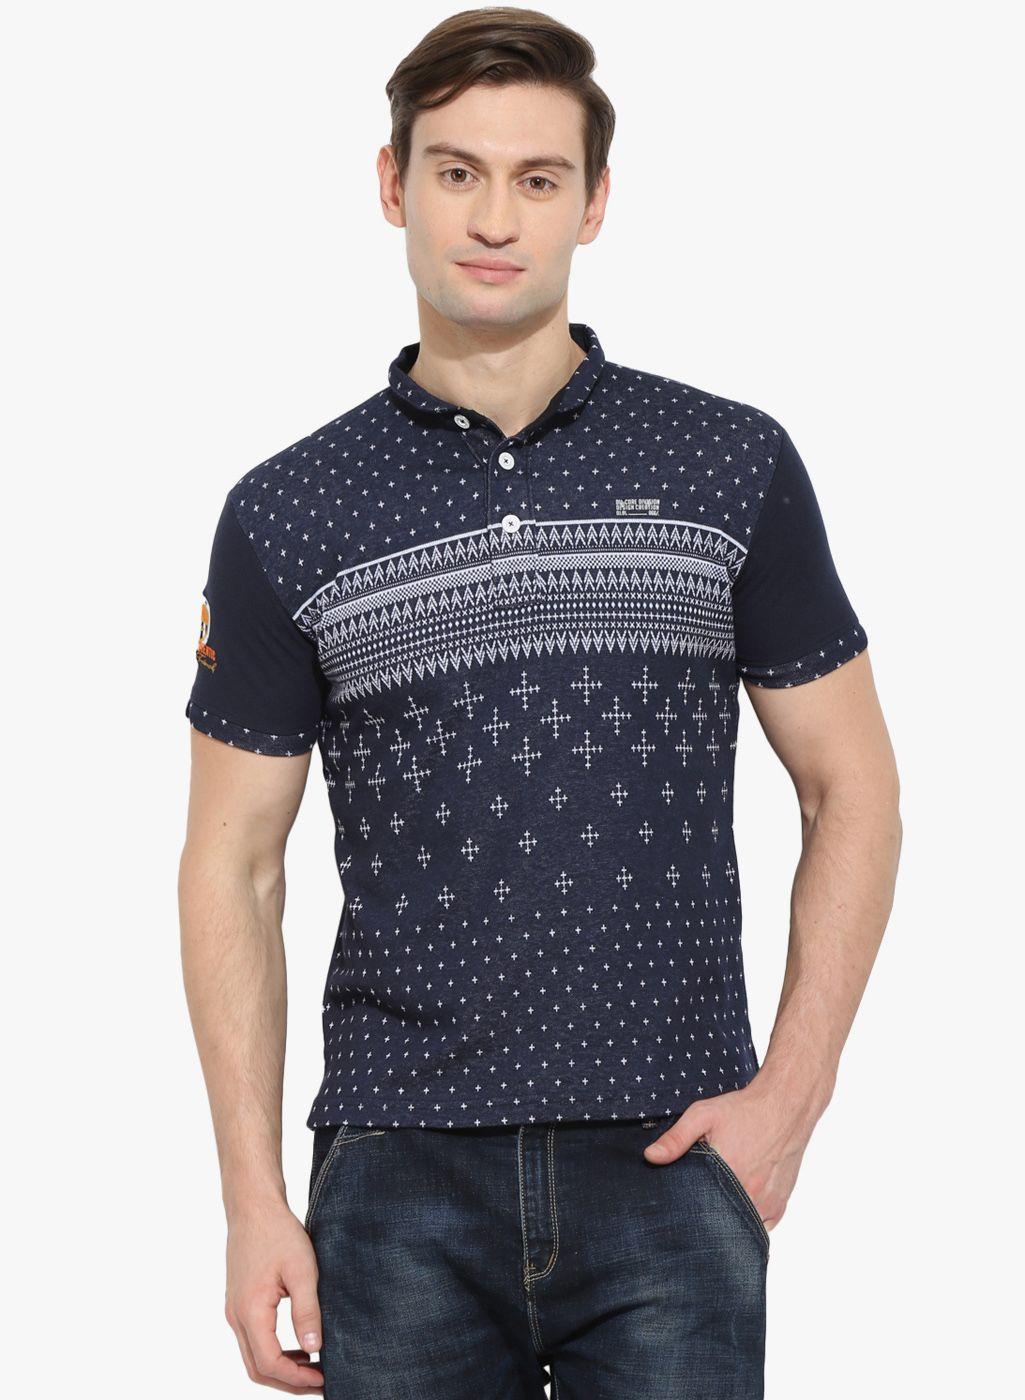 Navy Blue Printed Polo T Shirt Mens Fashion Pinterest Polo